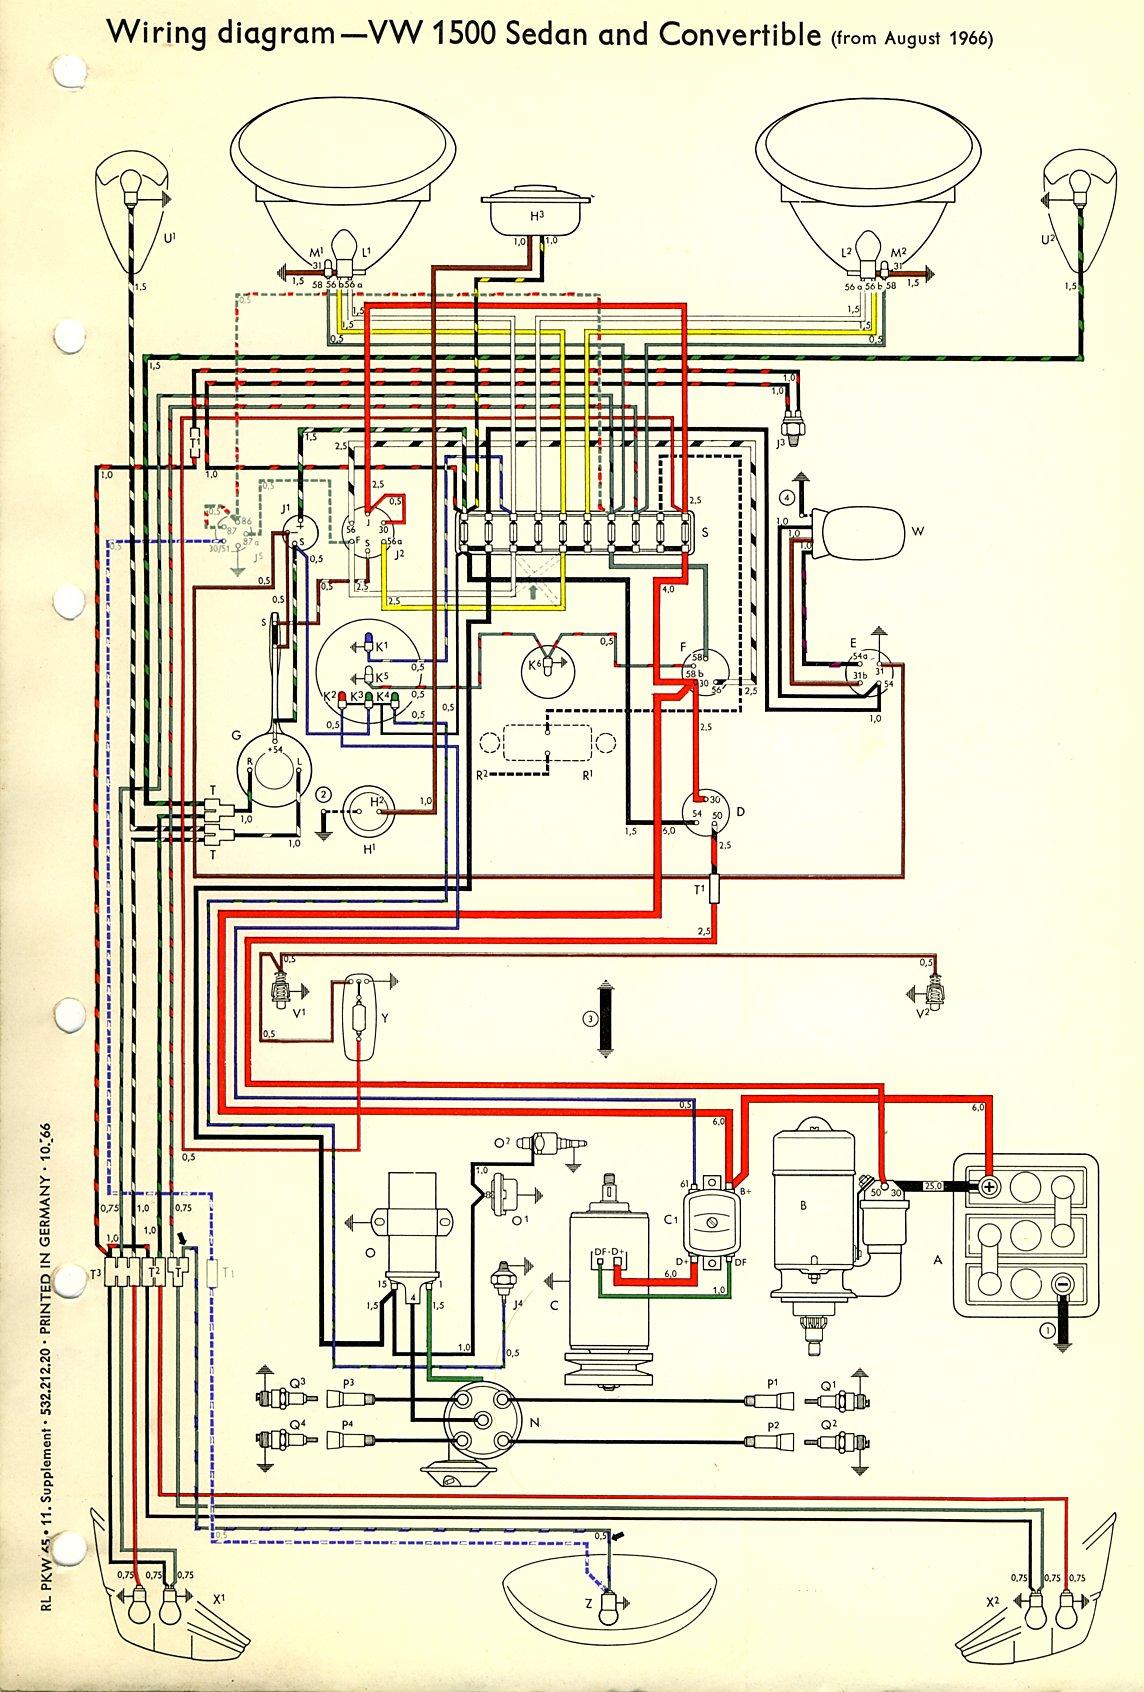 Sahkot Oikea Bug on 1971 Dodge Charger Wiring Diagram